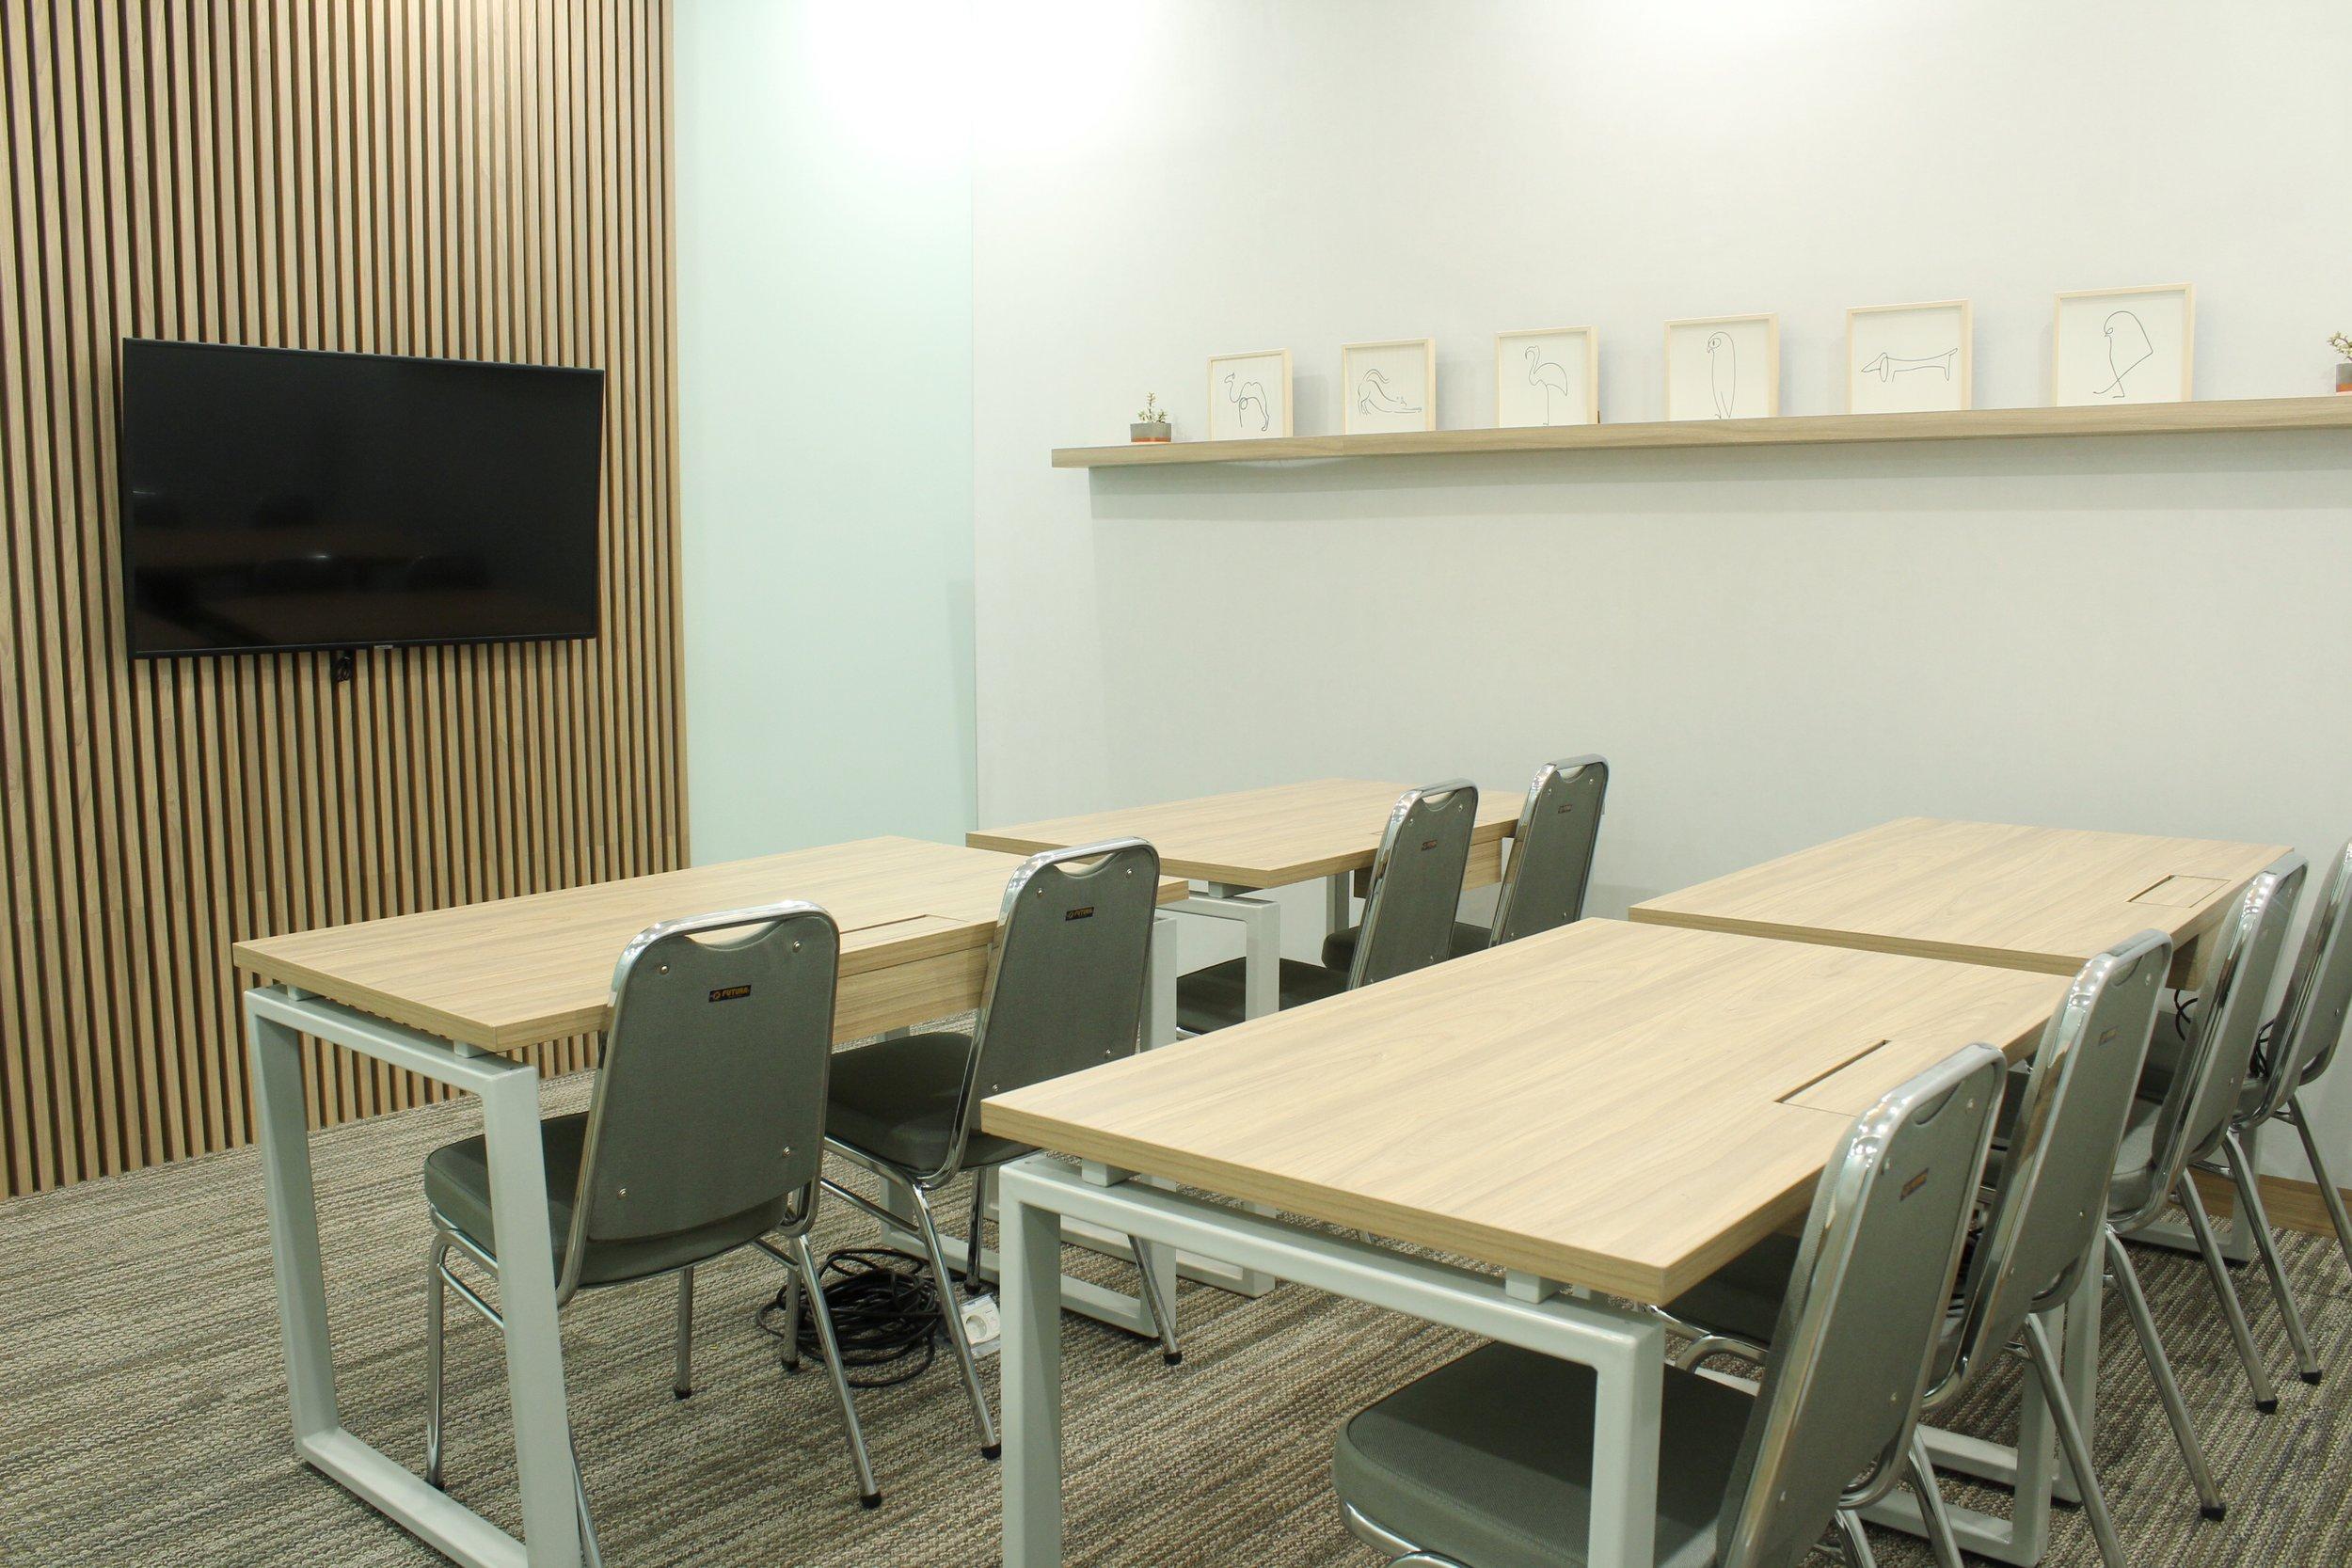 avenue8 meetin room classroom